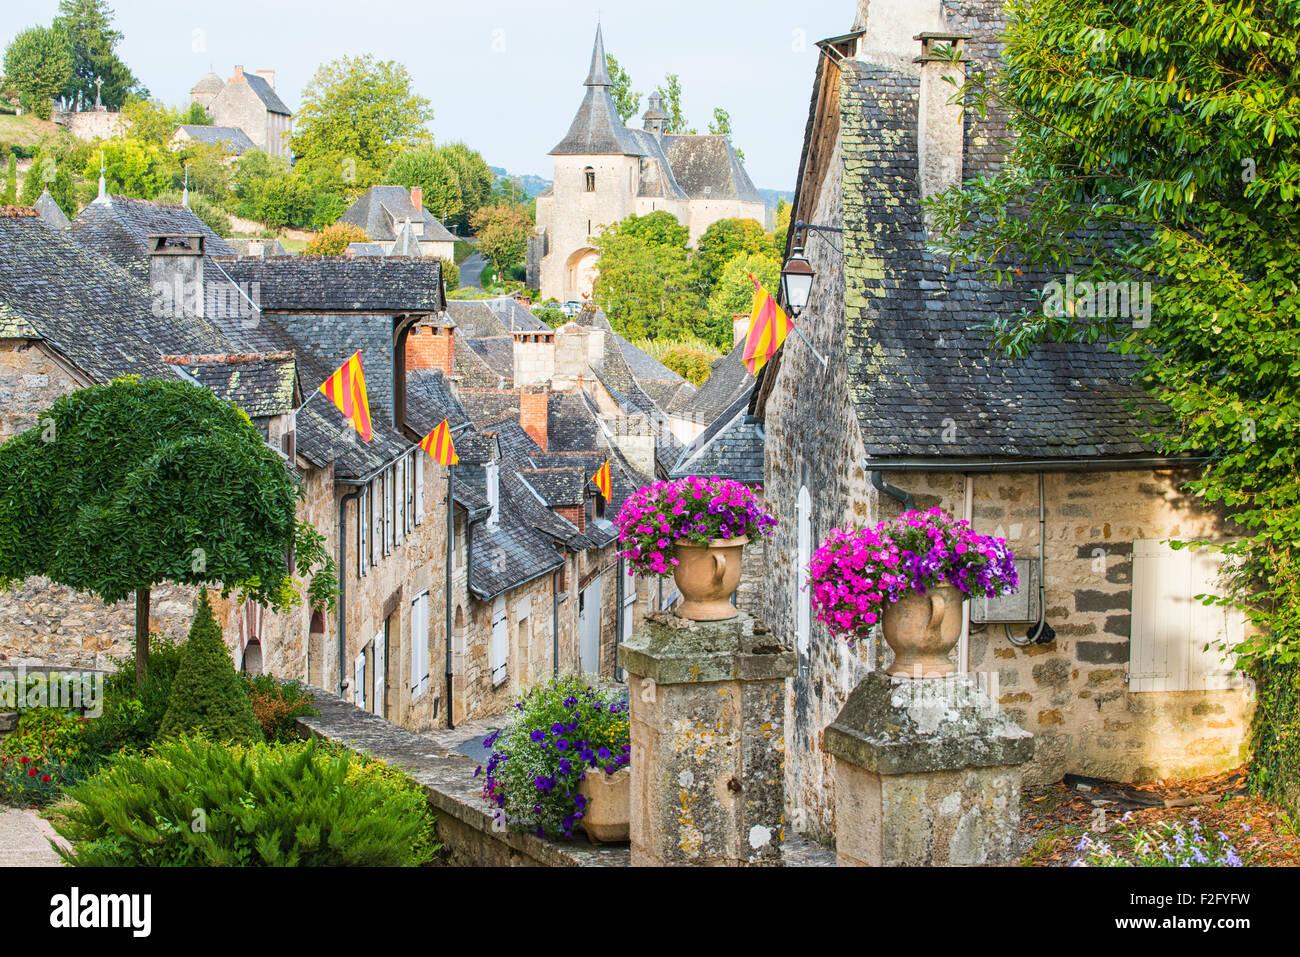 Turenne, Limousin, France - Stock Image